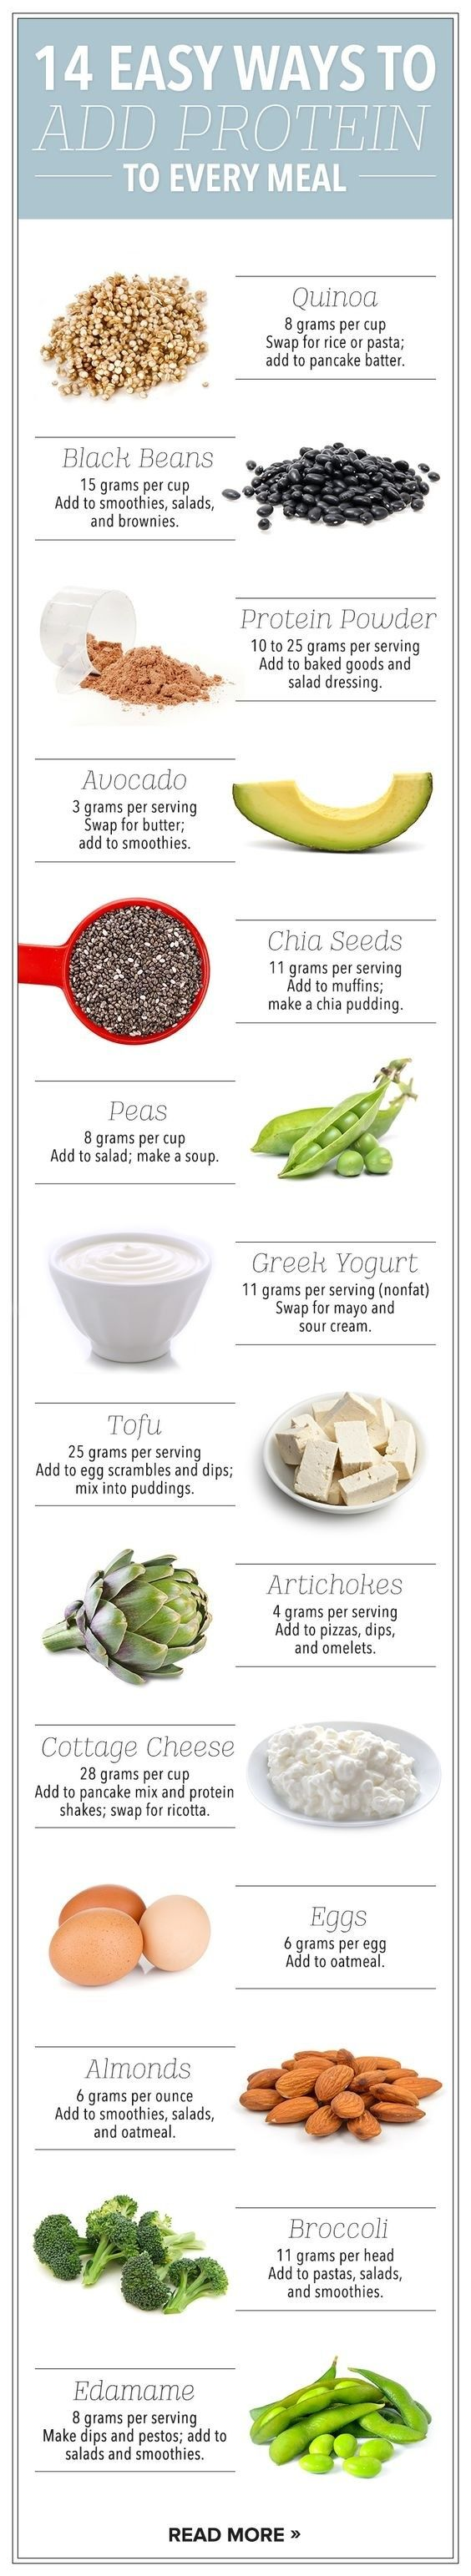 38++ How do vegetarians get protein trends